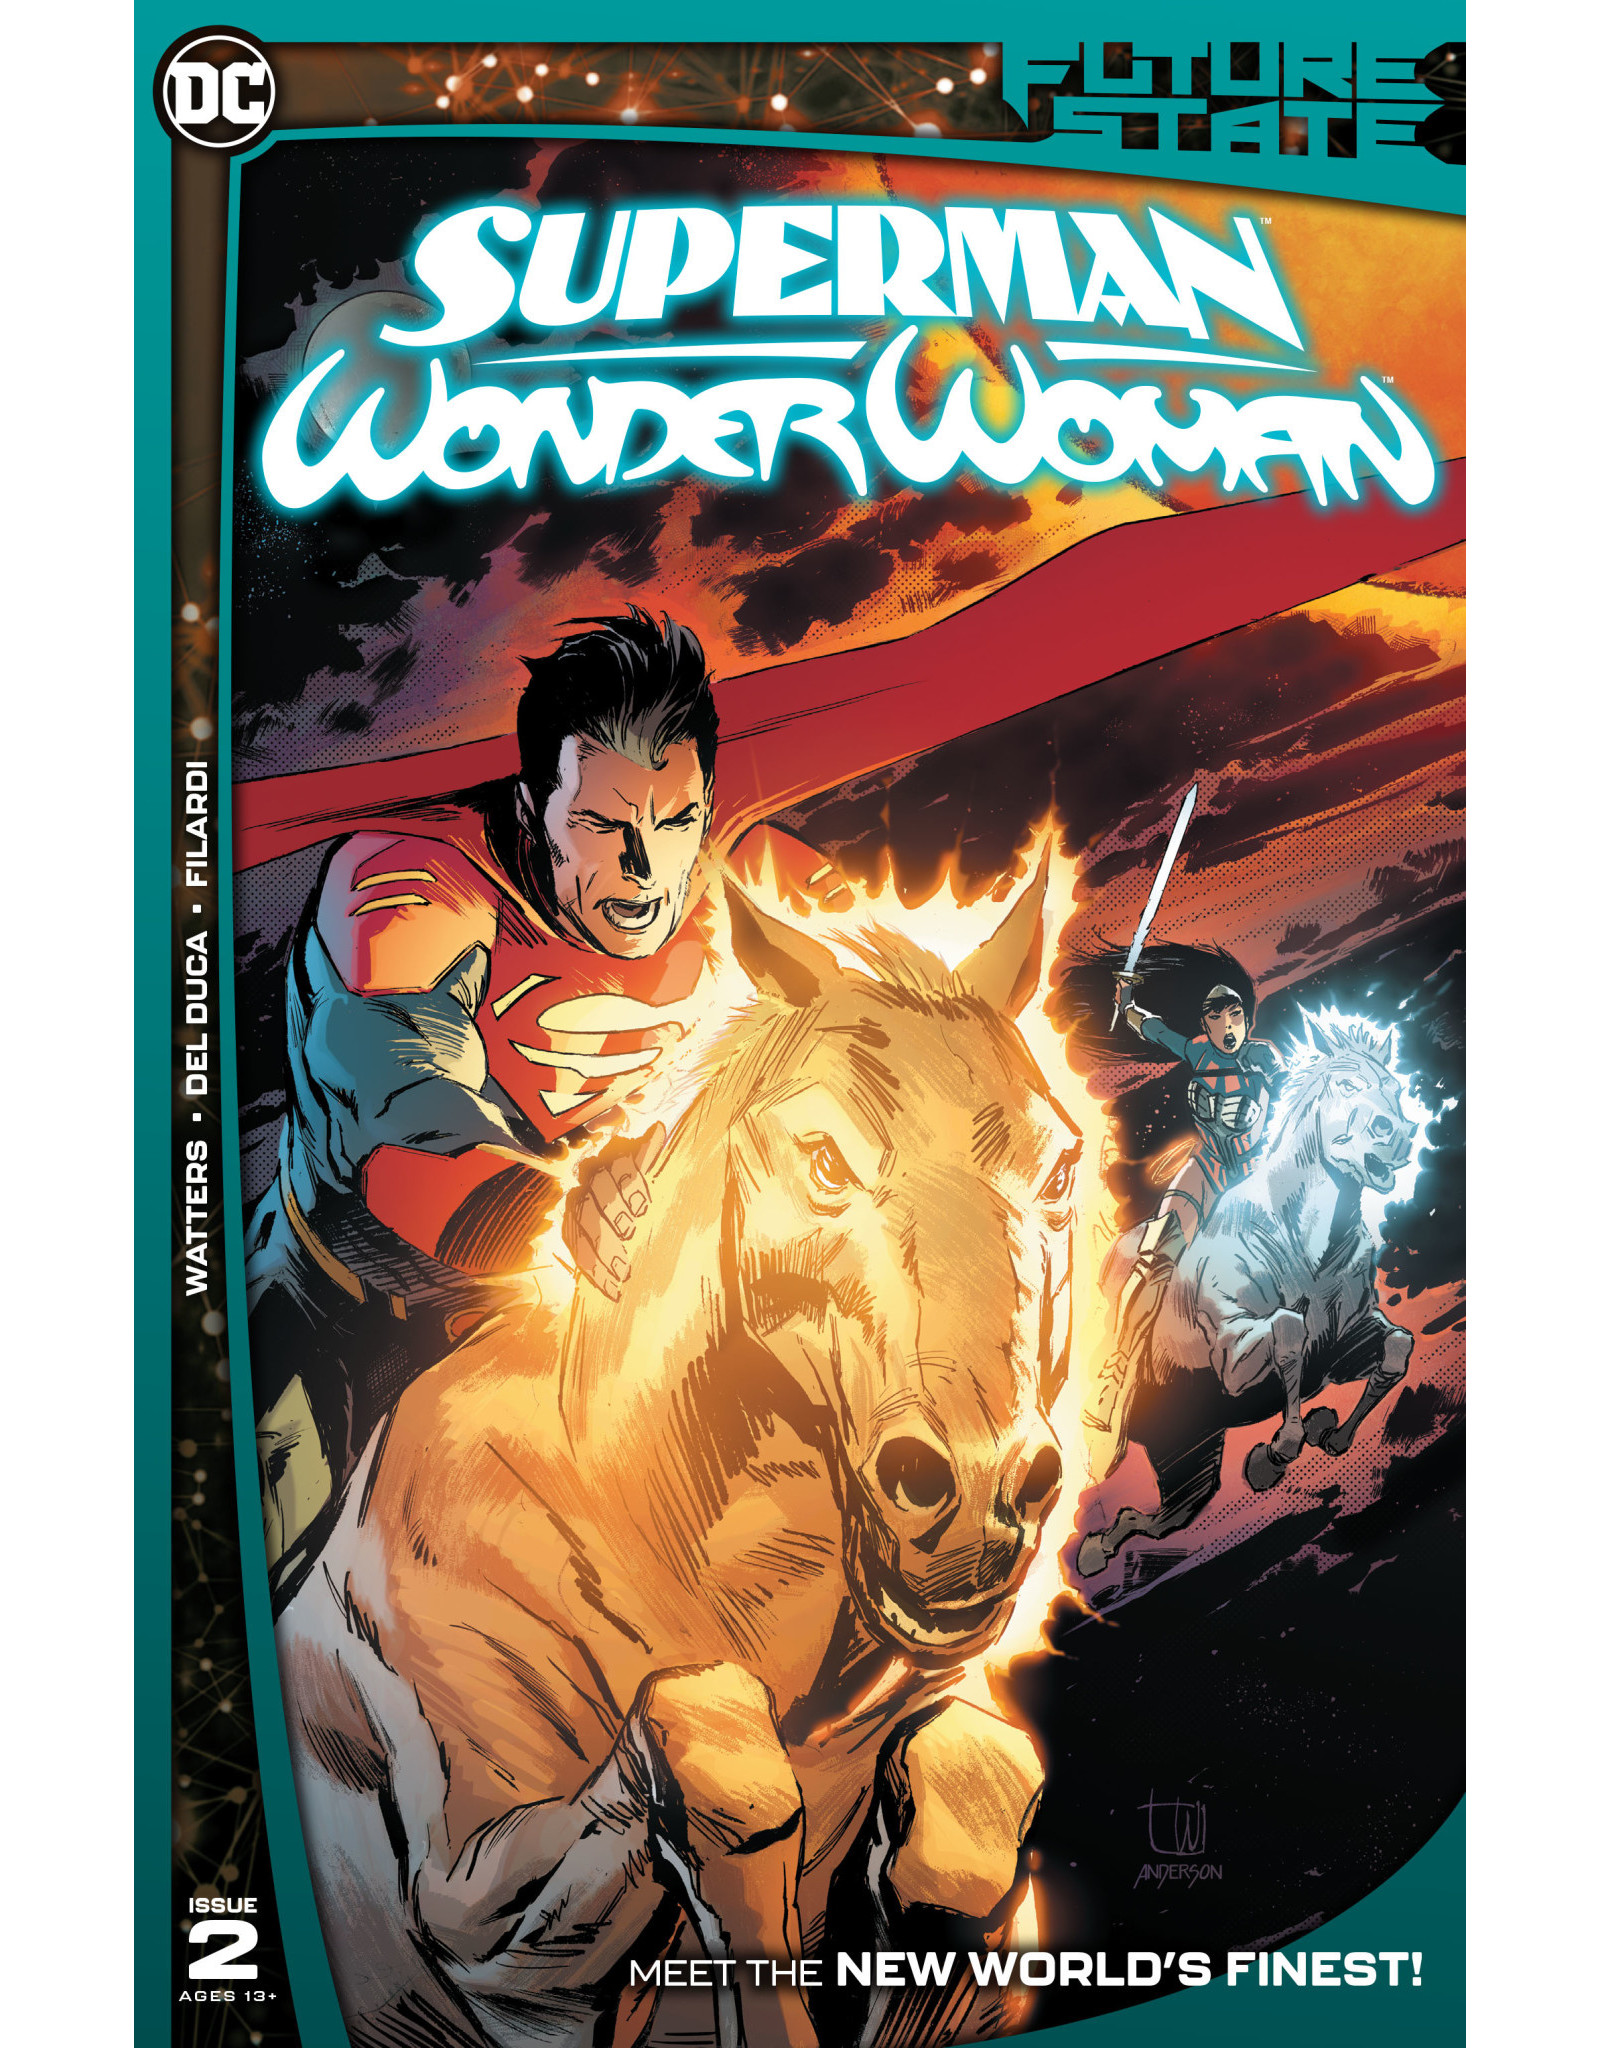 DC Comics FUTURE STATE SUPERMAN WONDER WOMAN #2 (OF 2) CVR A LEE WEEKS